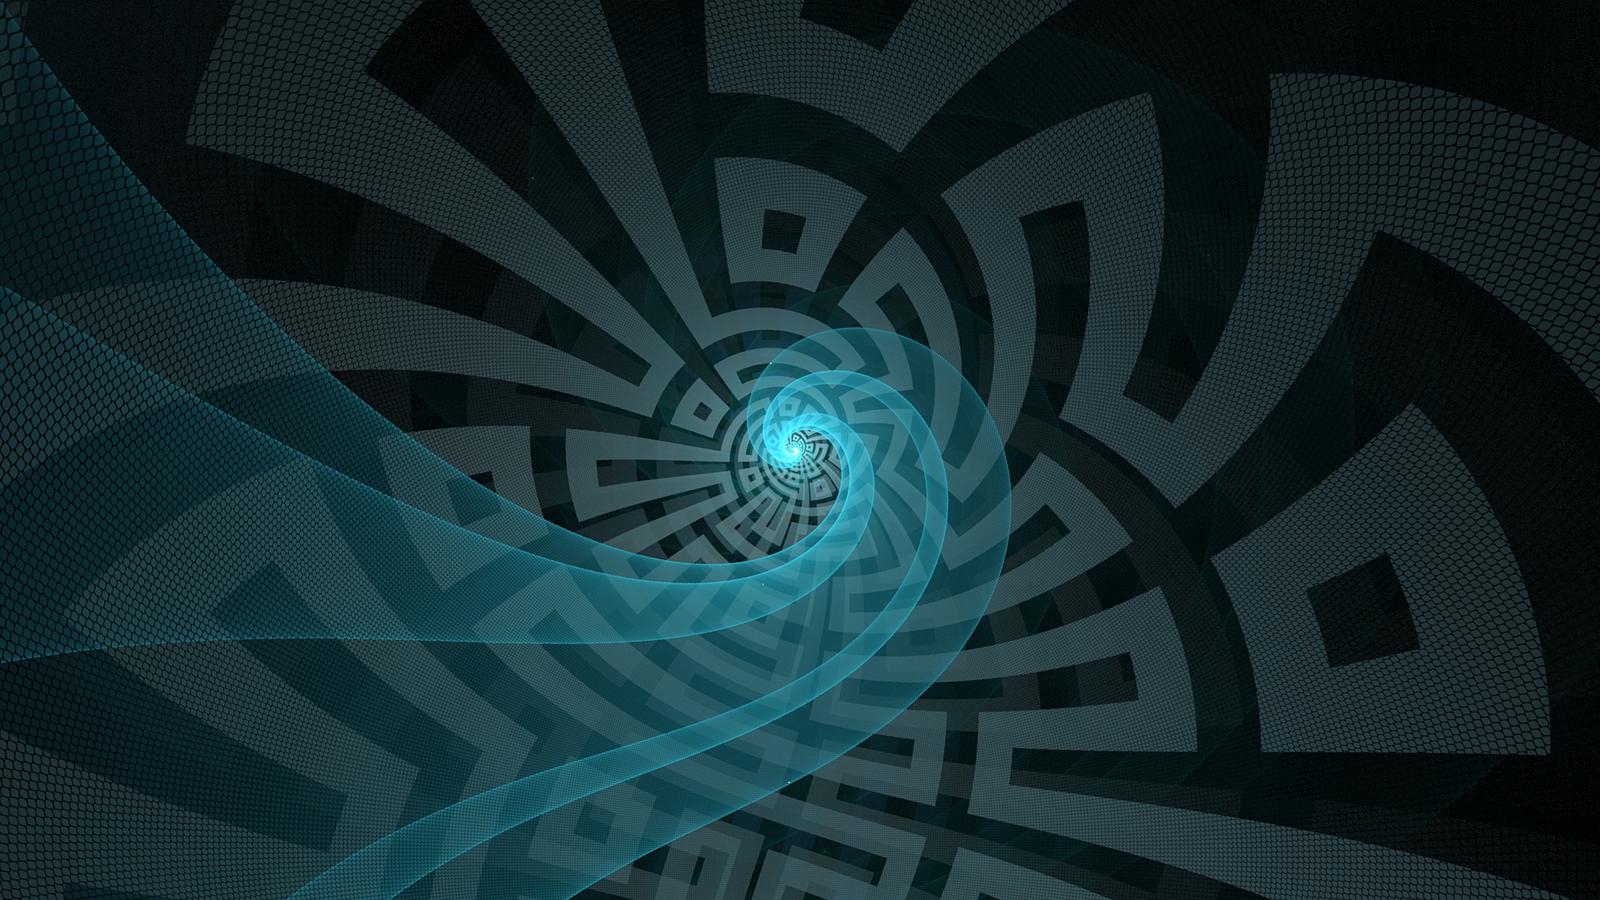 Kynetic Apo Contest Jan 2013 by Dawgit